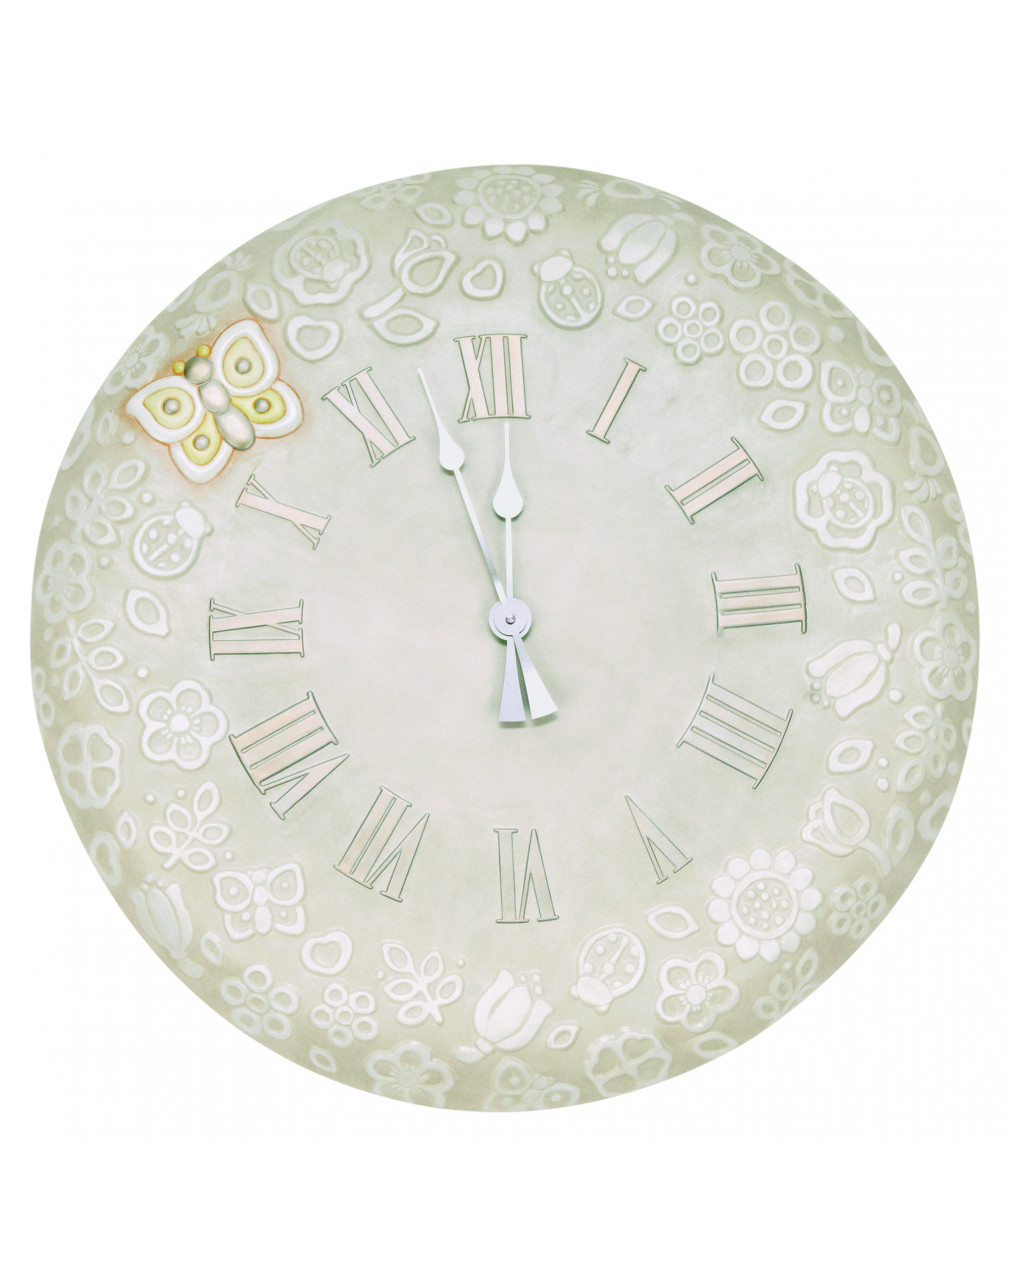 Beautiful orologi da cucina thun ideas home interior for Formelle thun saldi